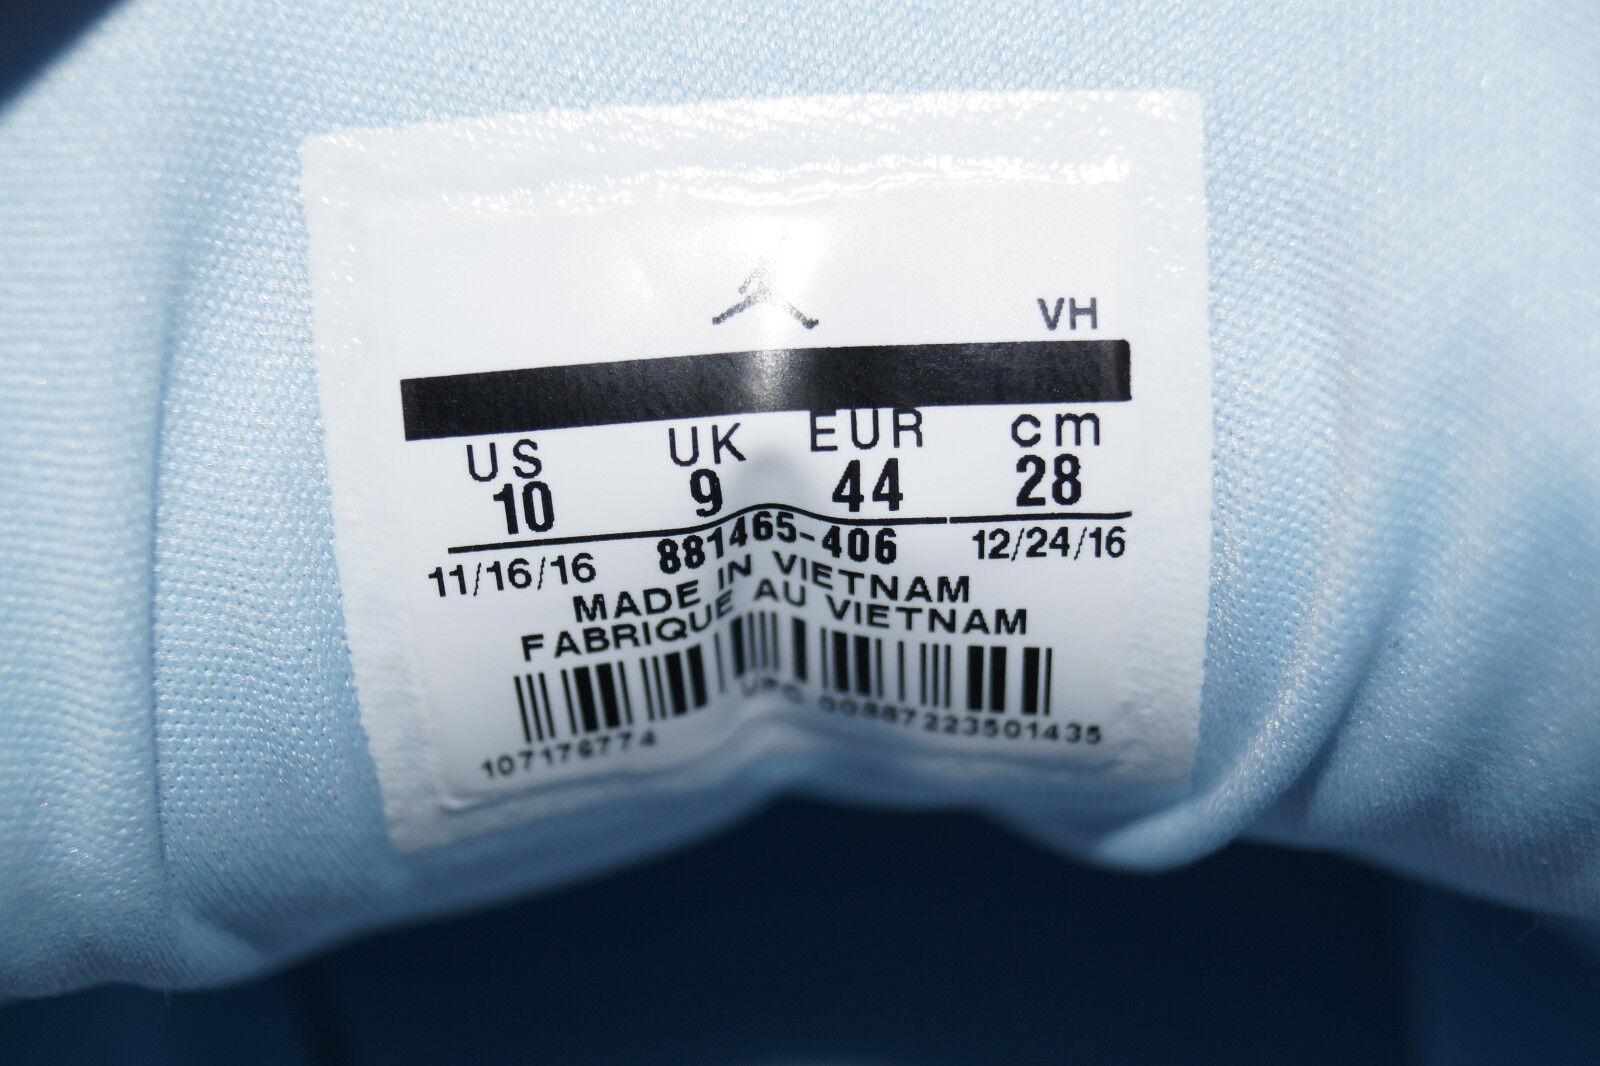 Nike Jordan Formula 23 Gr.44 UK.9 406 ice Blau blau 881465 406 UK.9 Sneaker Trainer e8c991